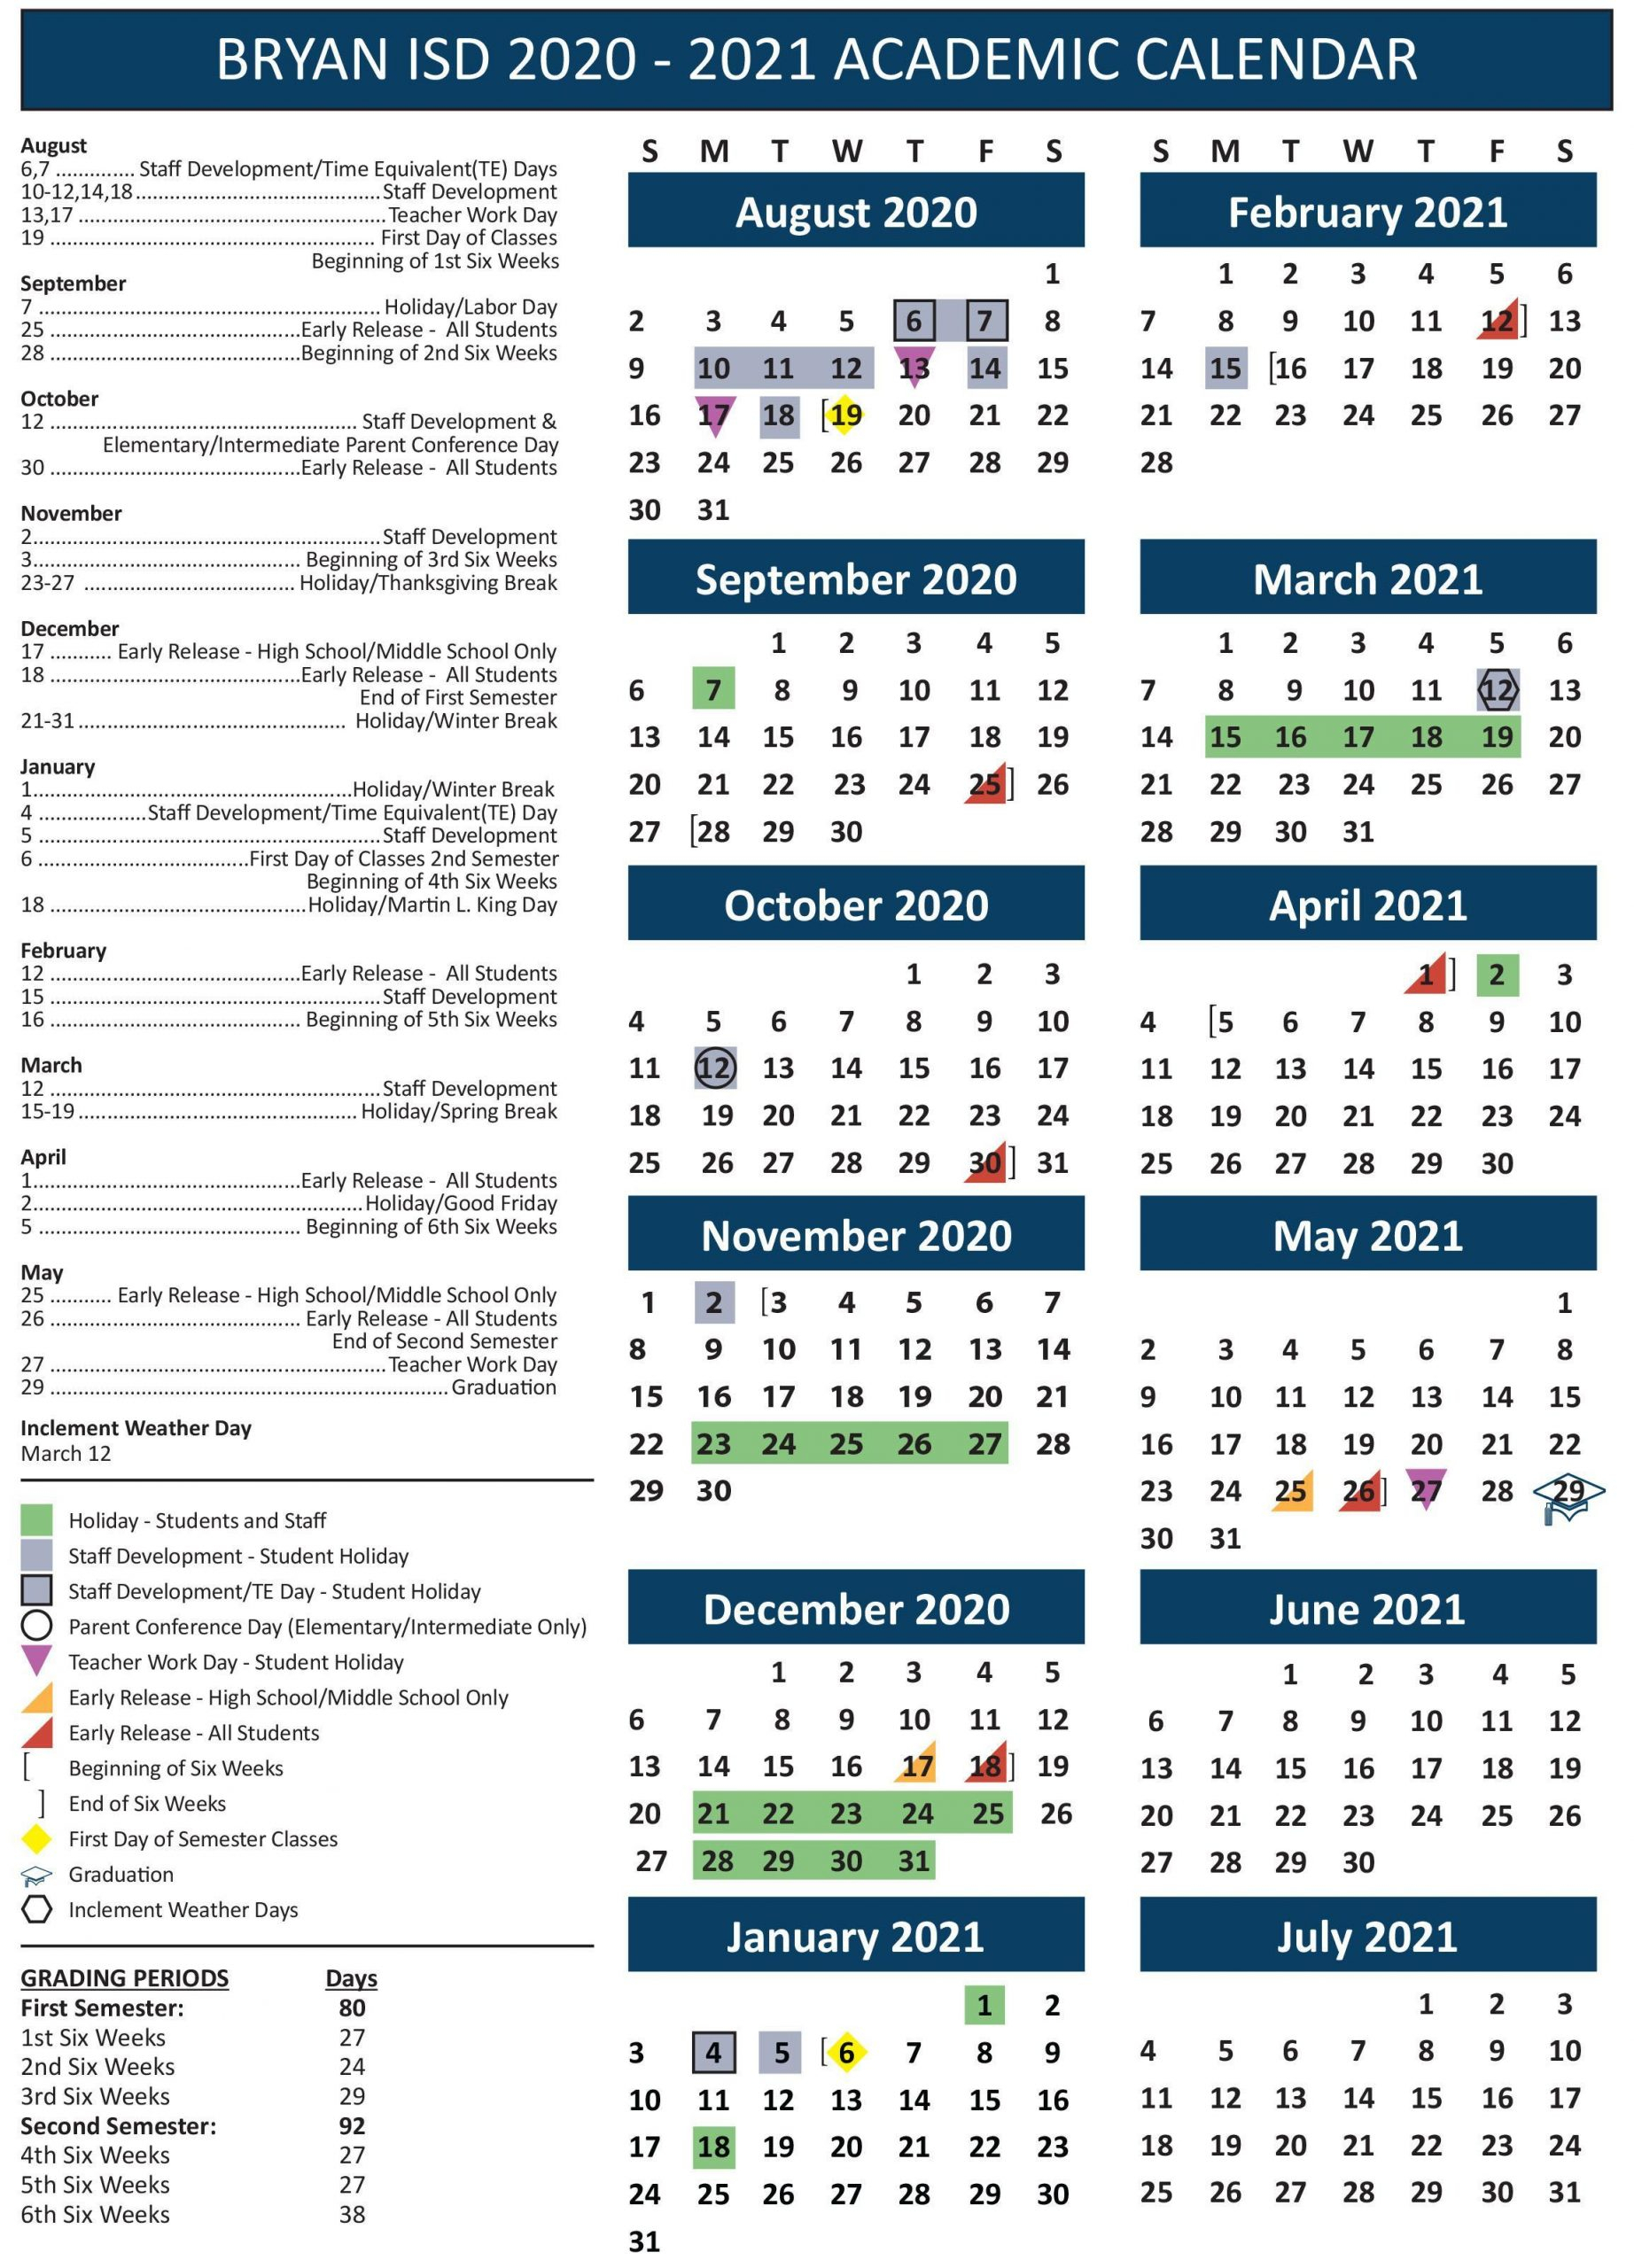 Collect Jan 2020 Calendar For Stephen F Austin | Calendar pertaining to Sfa 2021 Calendar